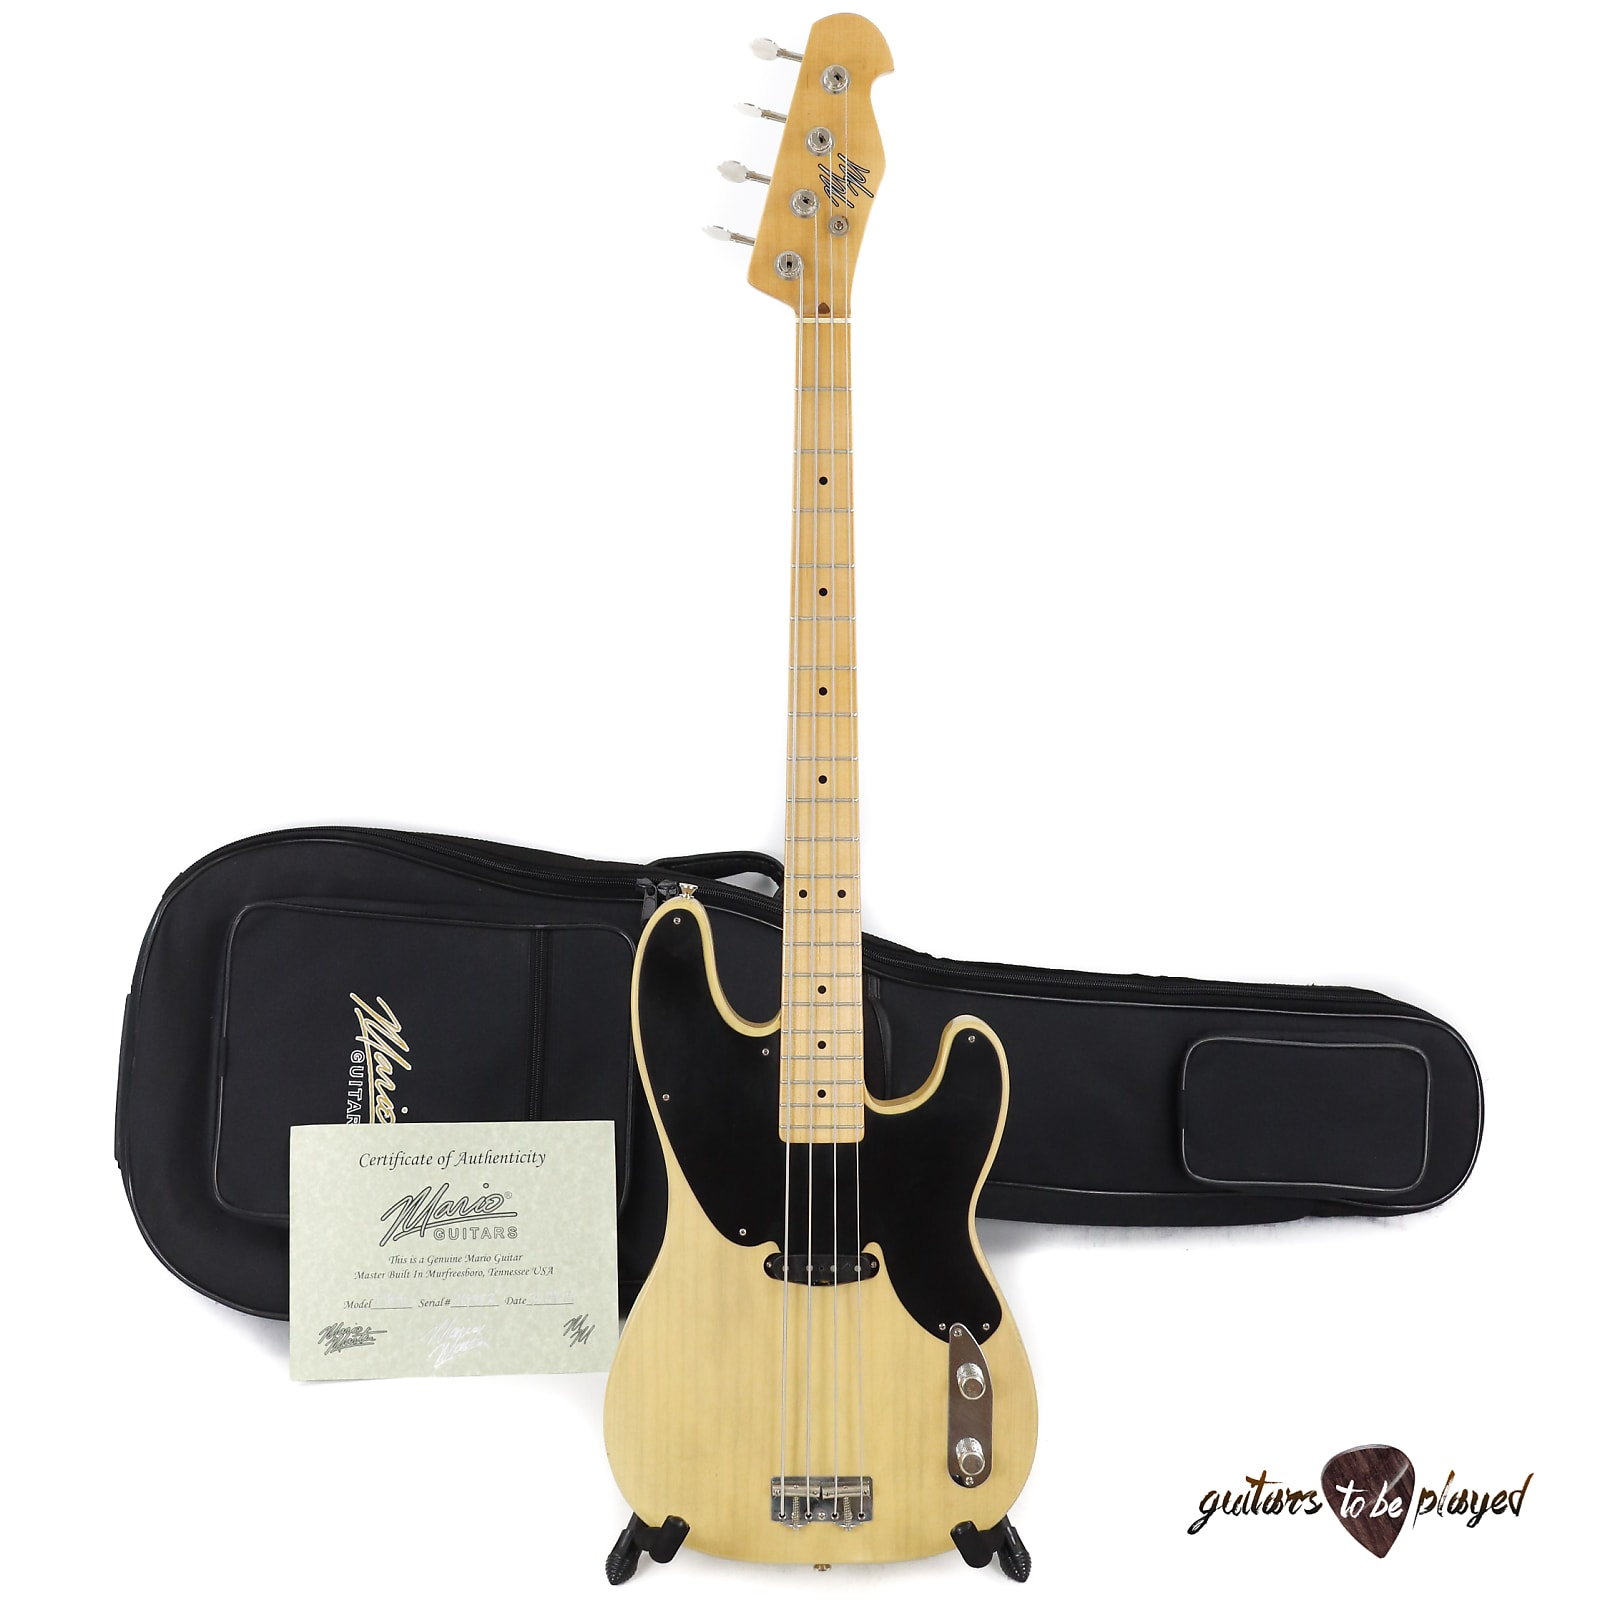 Mario Martin T-Bass Telecaster Bass, Mojotone '52 Clone P-Bass Pickup - 6lb 6oz